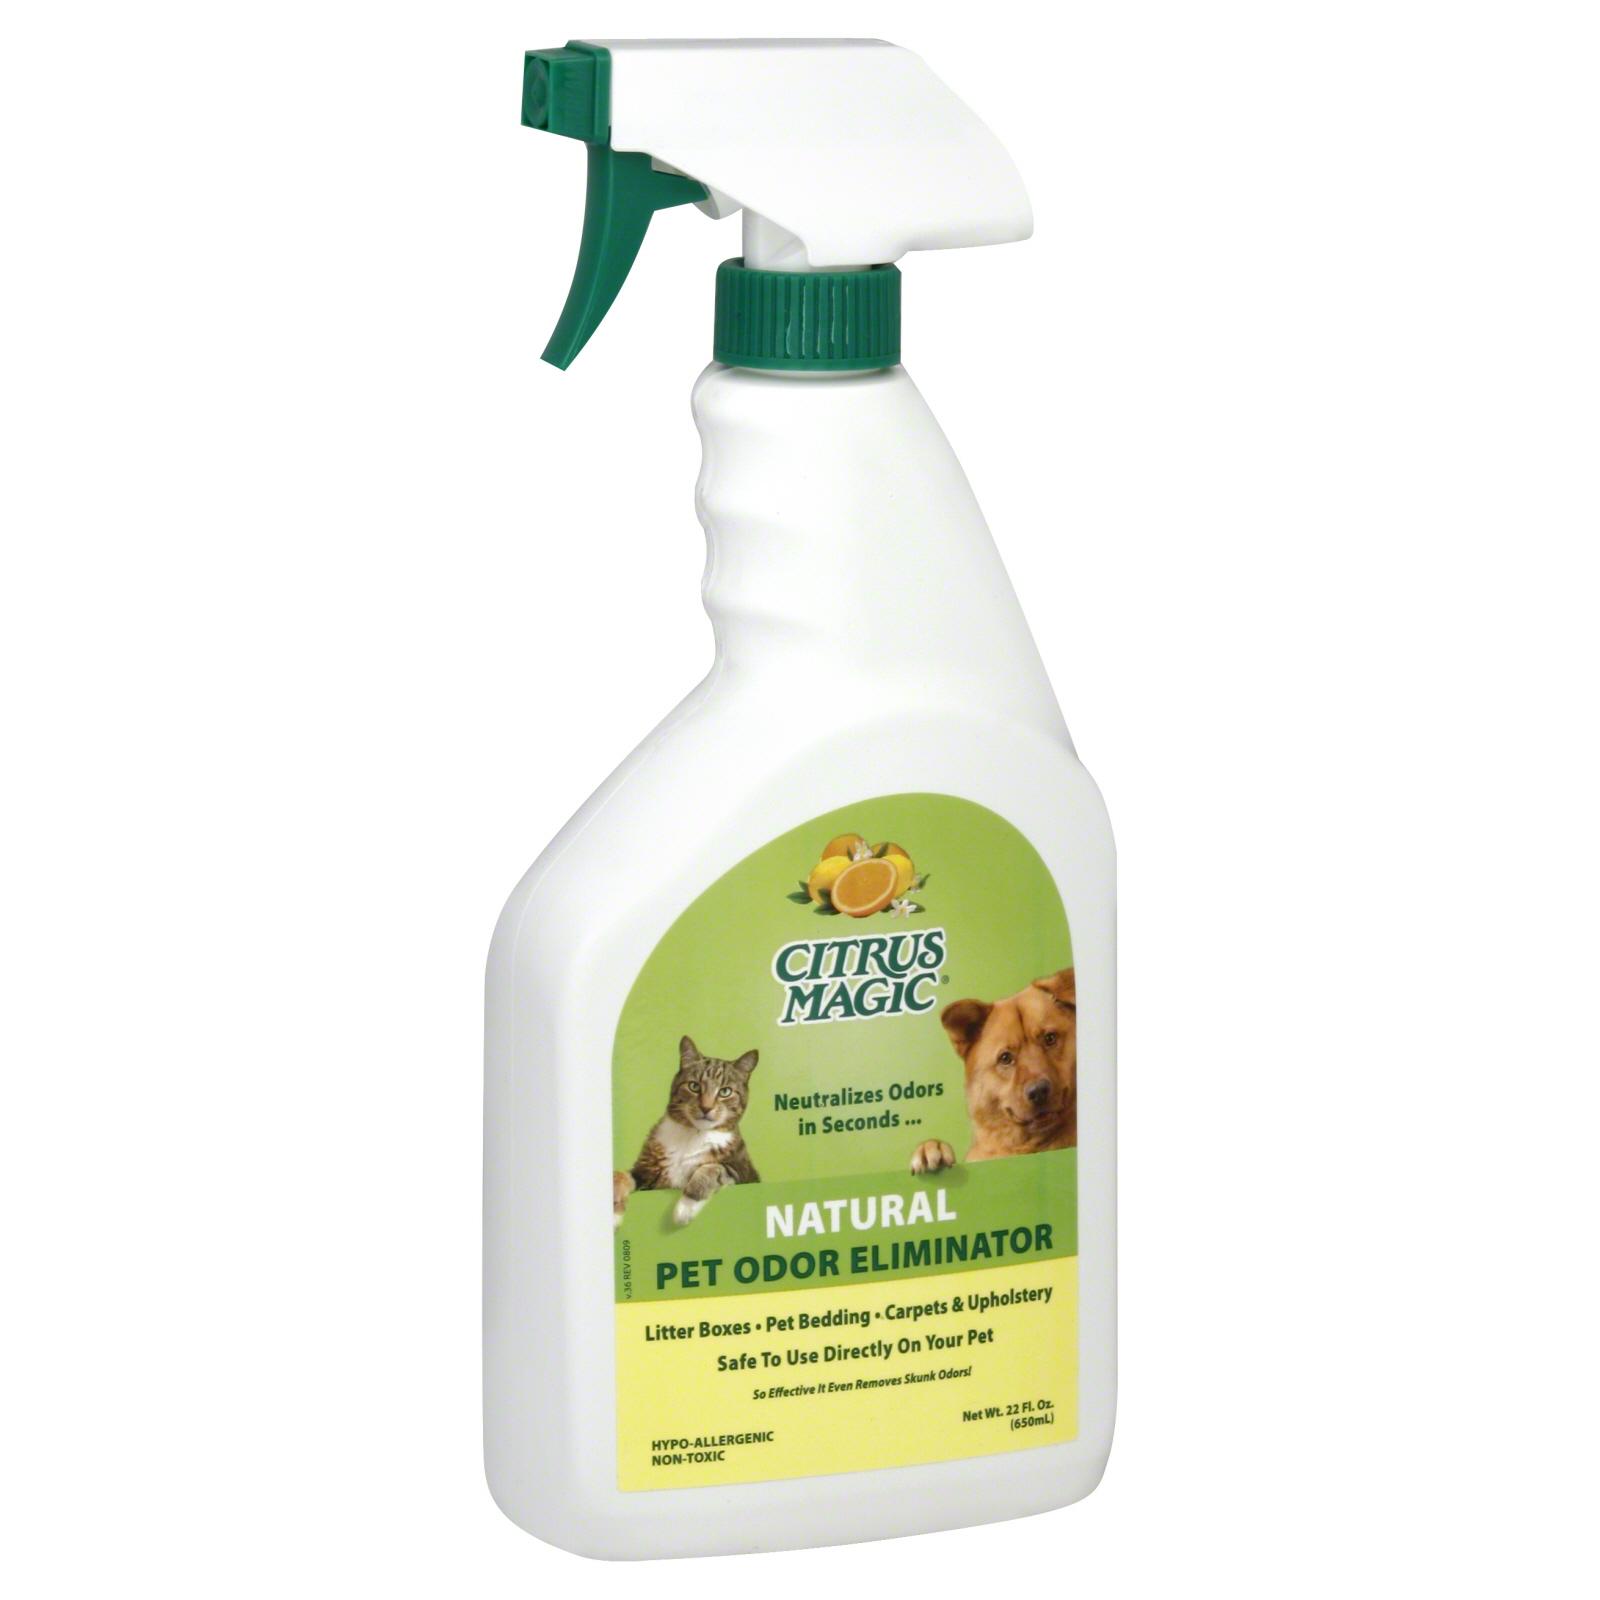 natural sofa deodorizer rounded table citrus magic odor eliminator pet 22 fl oz 650 ml